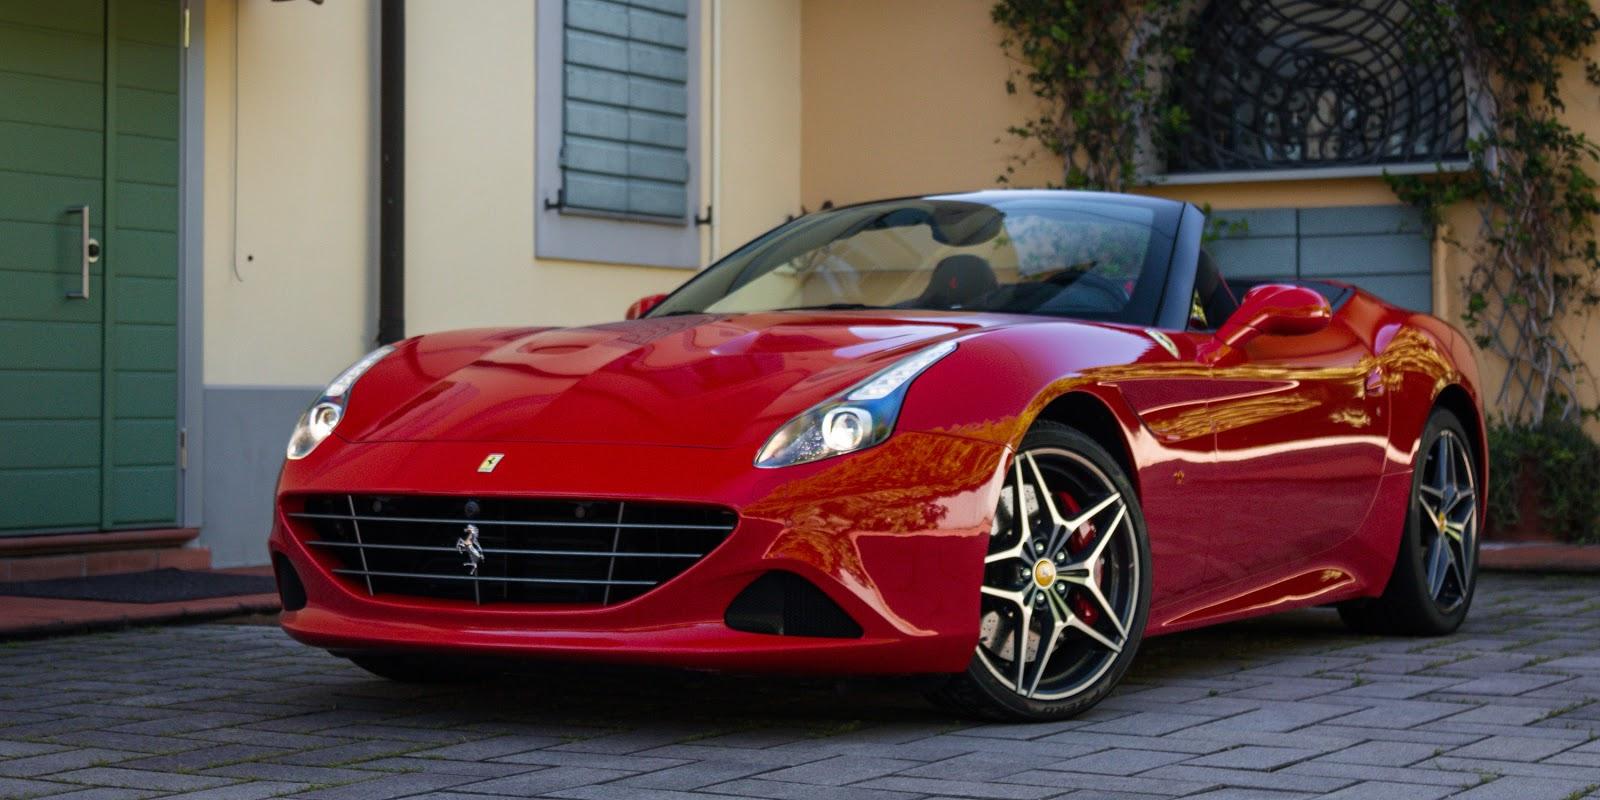 Đánh giá siêu xe Ferrari California T 2016